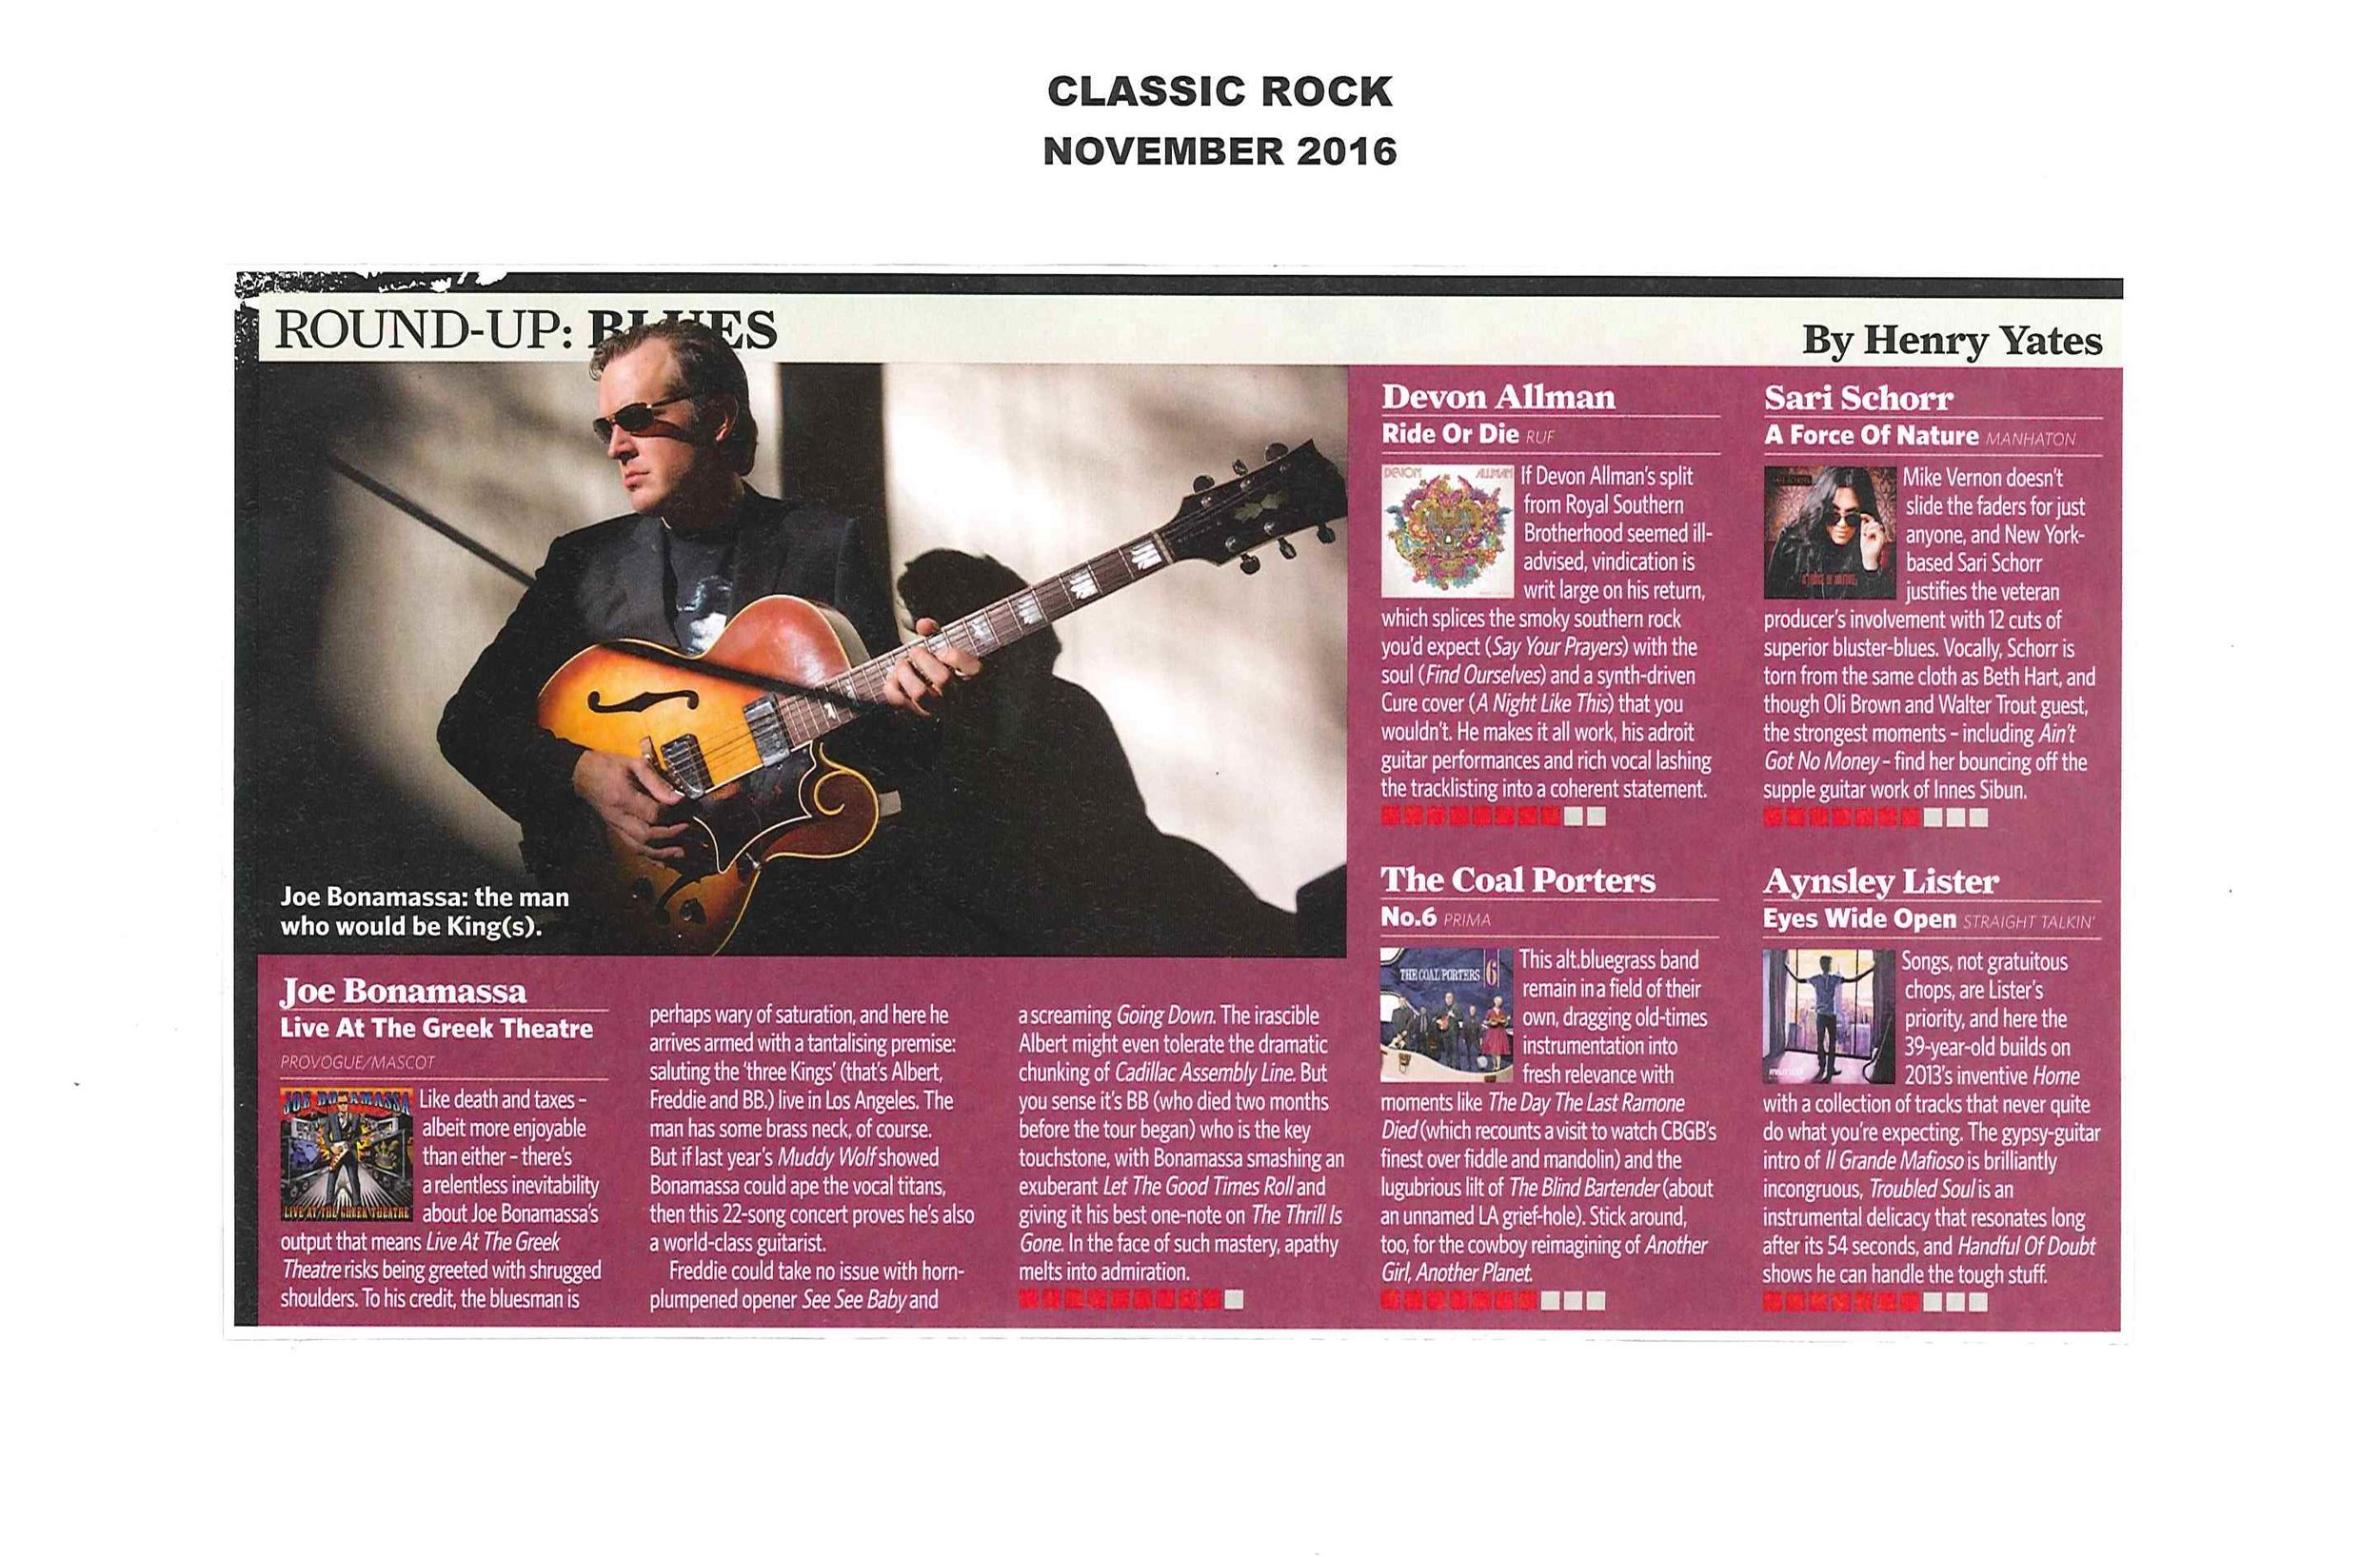 Classic Rock_November 2016_Sari Schorr_Album Review_2.jpg